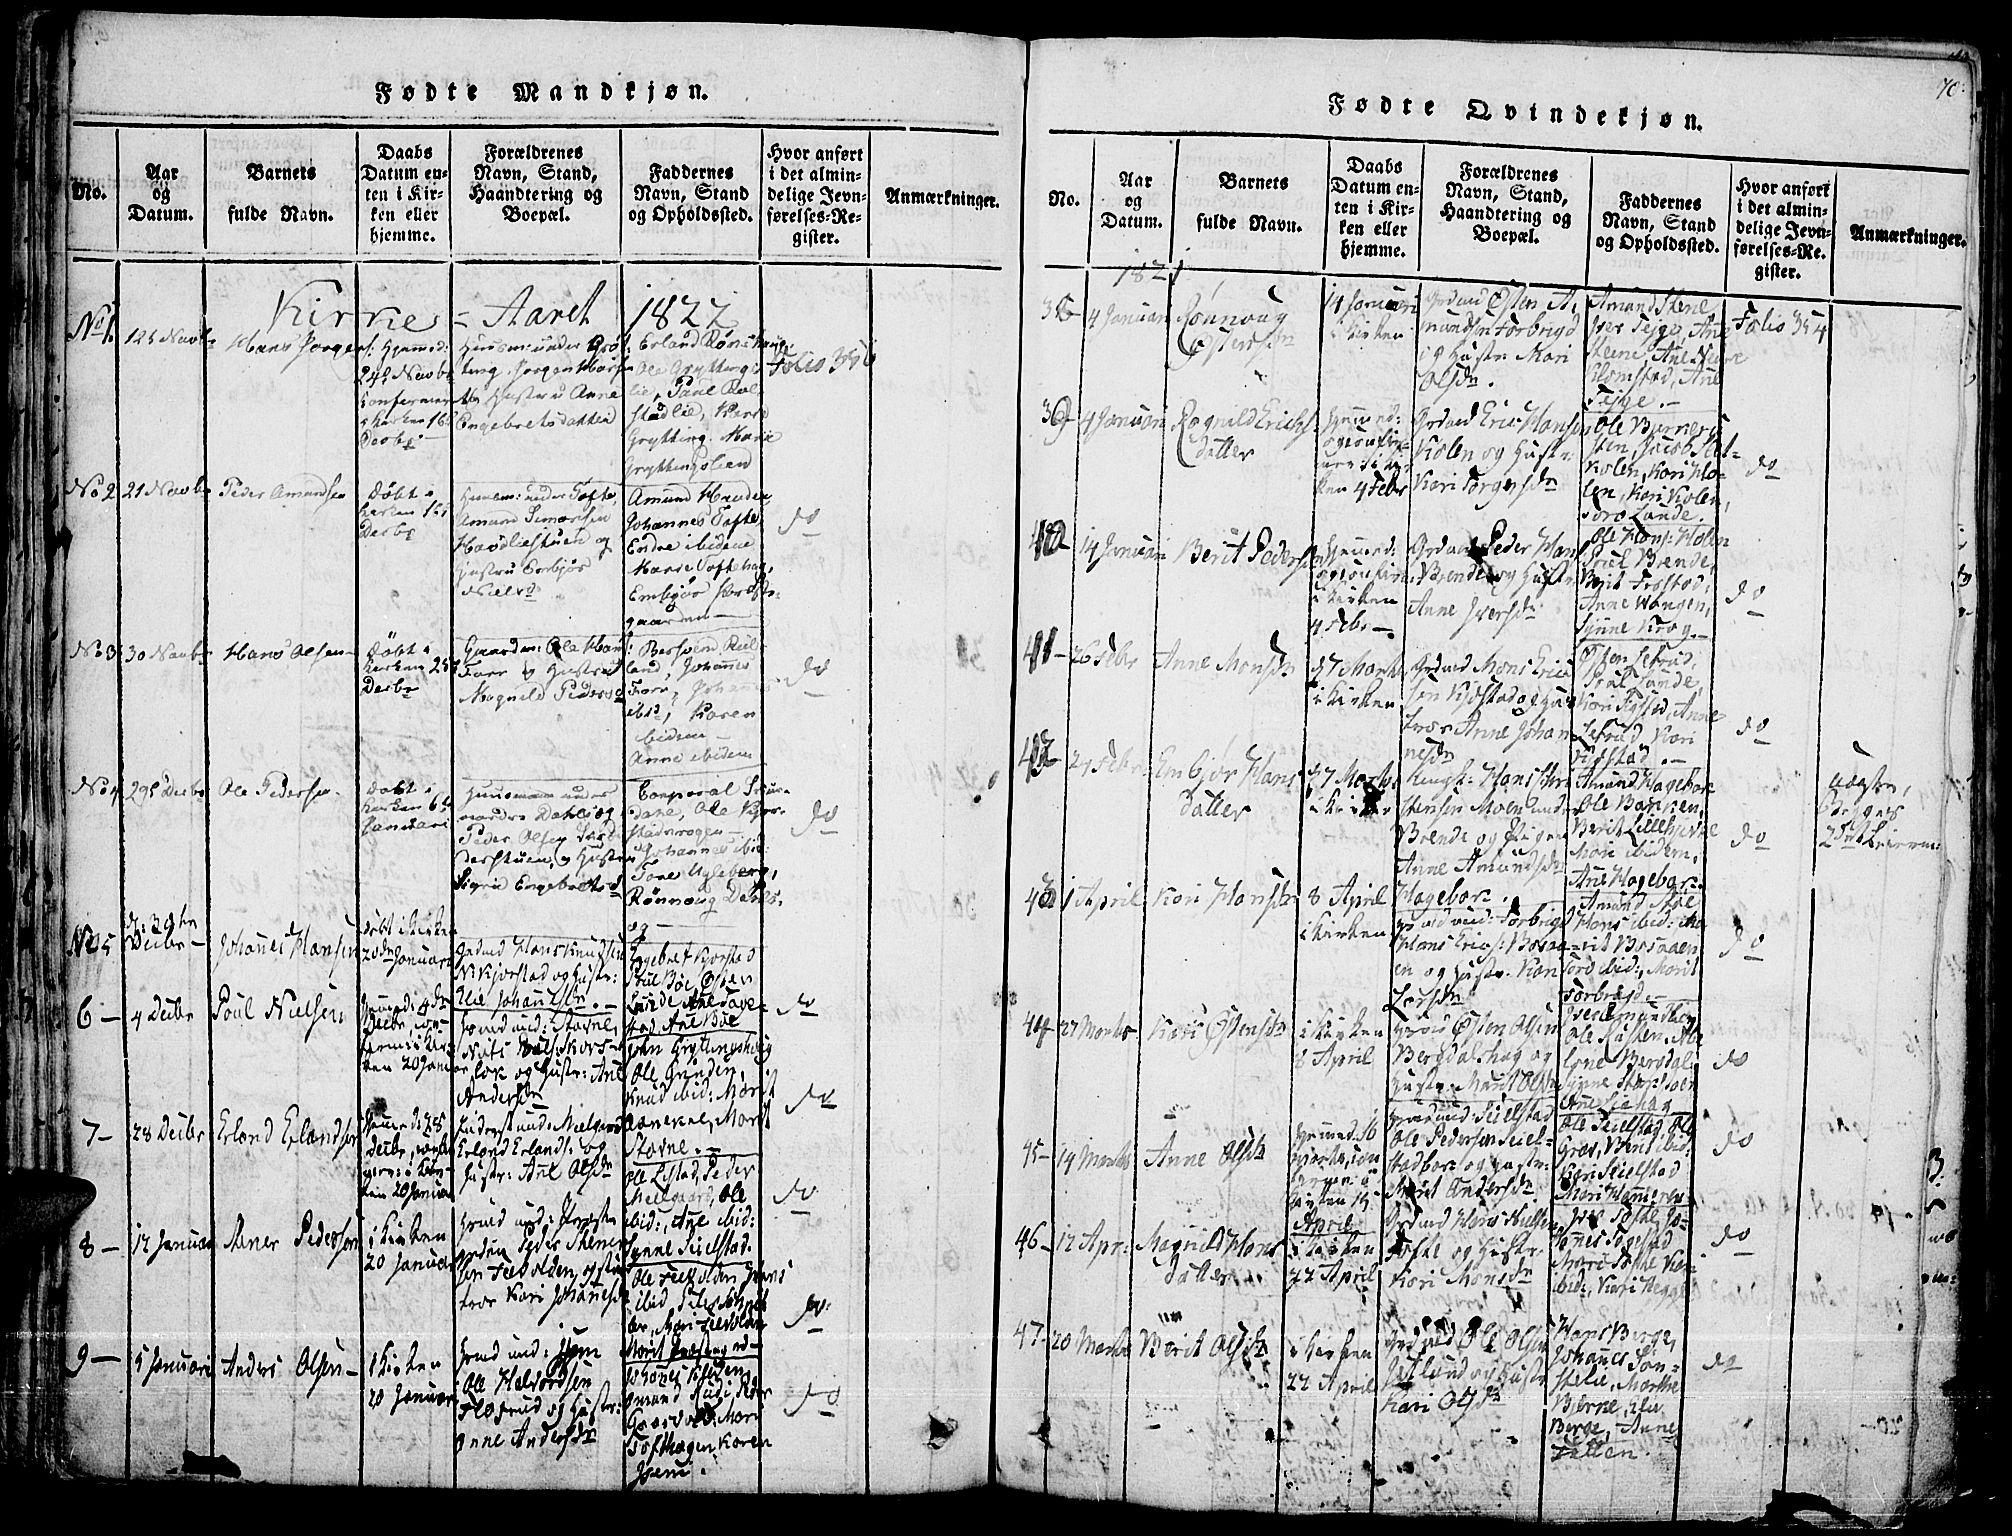 SAH, Fron prestekontor, H/Ha/Haa/L0002: Ministerialbok nr. 2, 1816-1827, s. 70